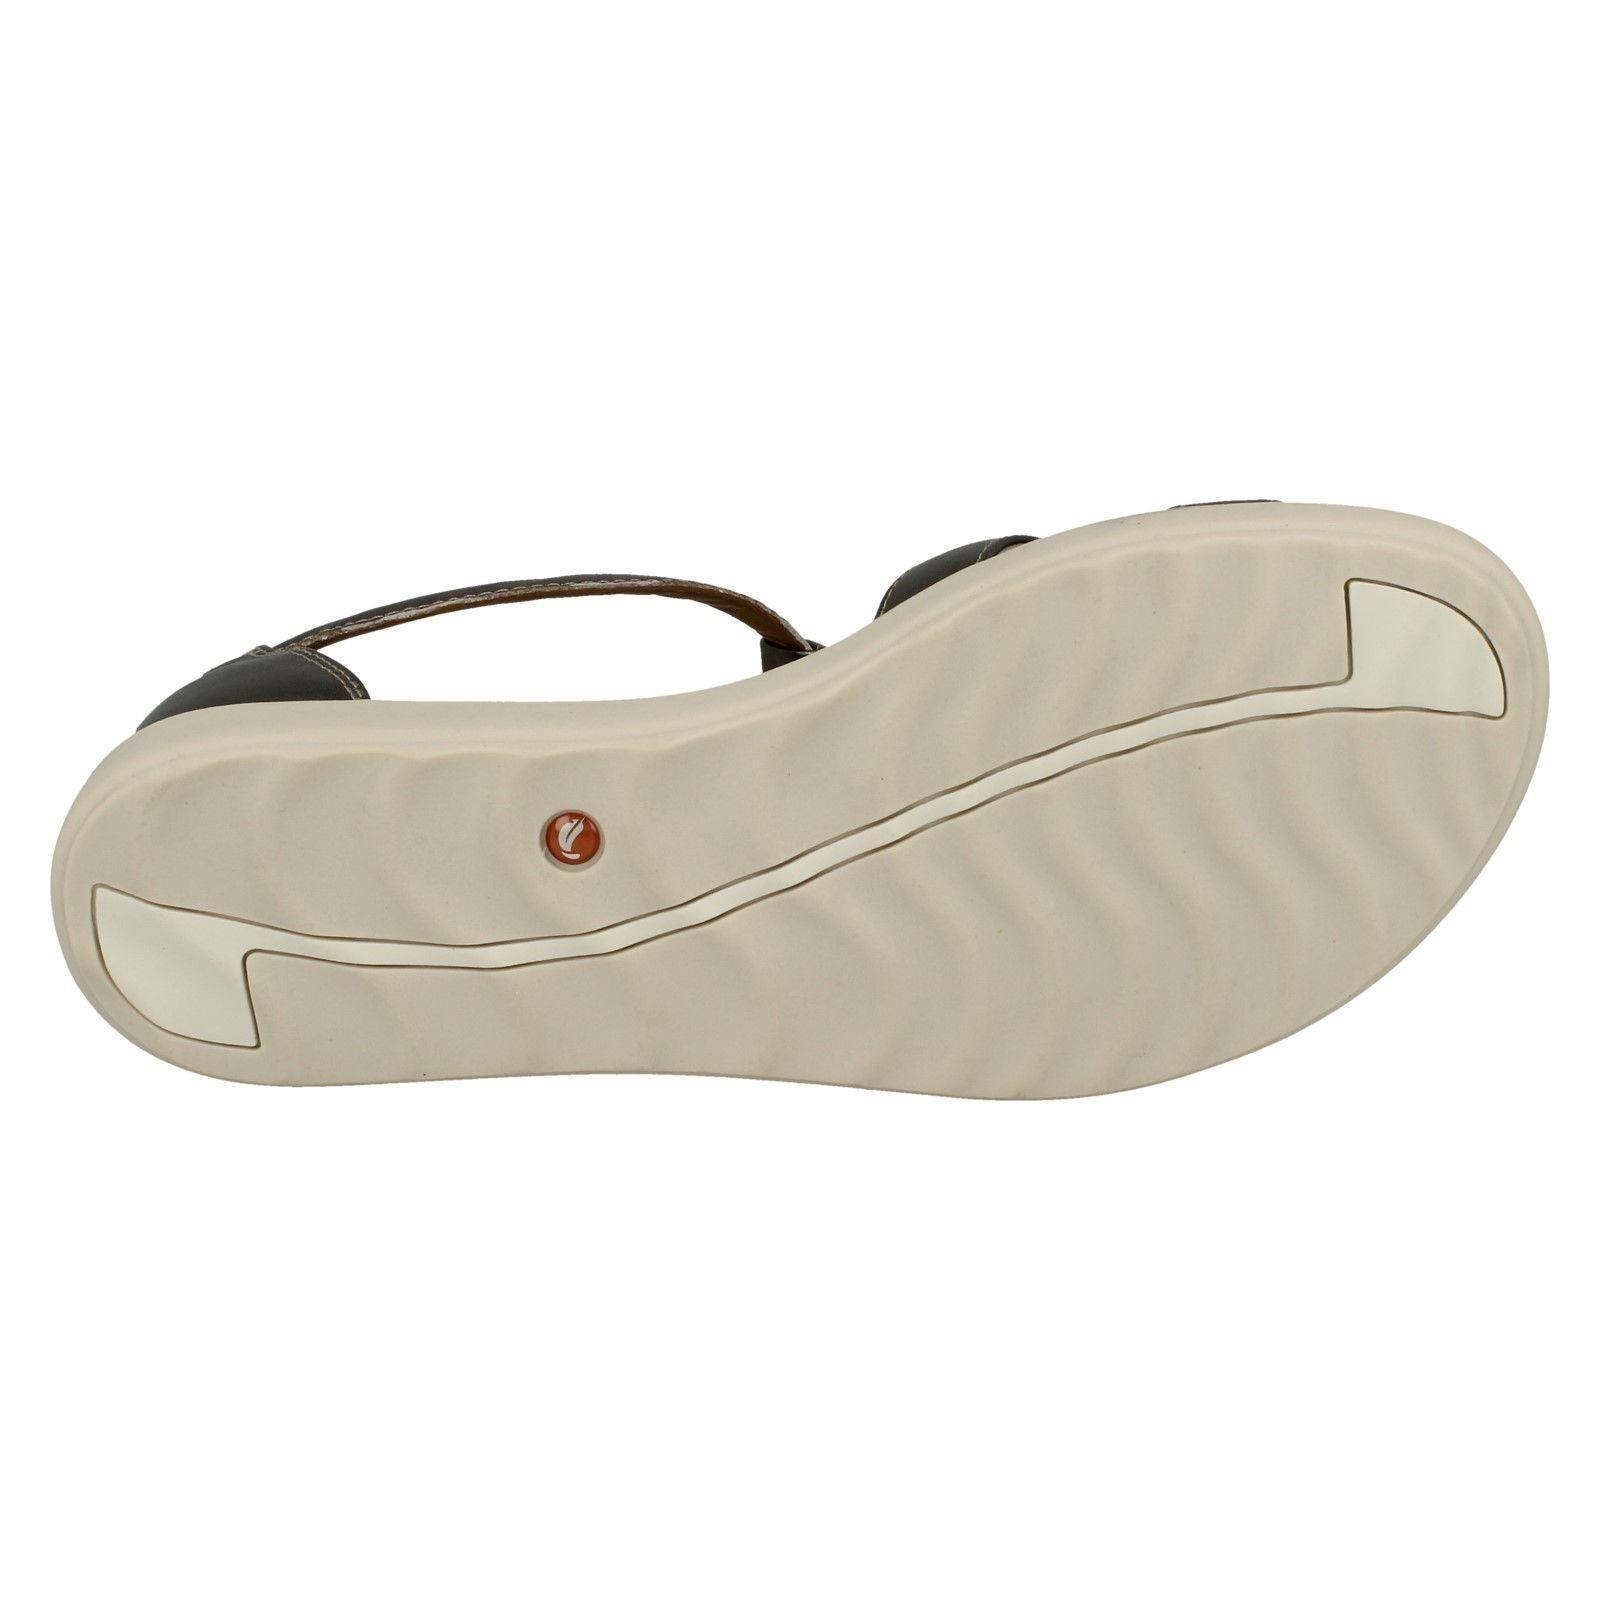 Femmes-Clarks-sandale-laniere-Un-Reisel-Mara